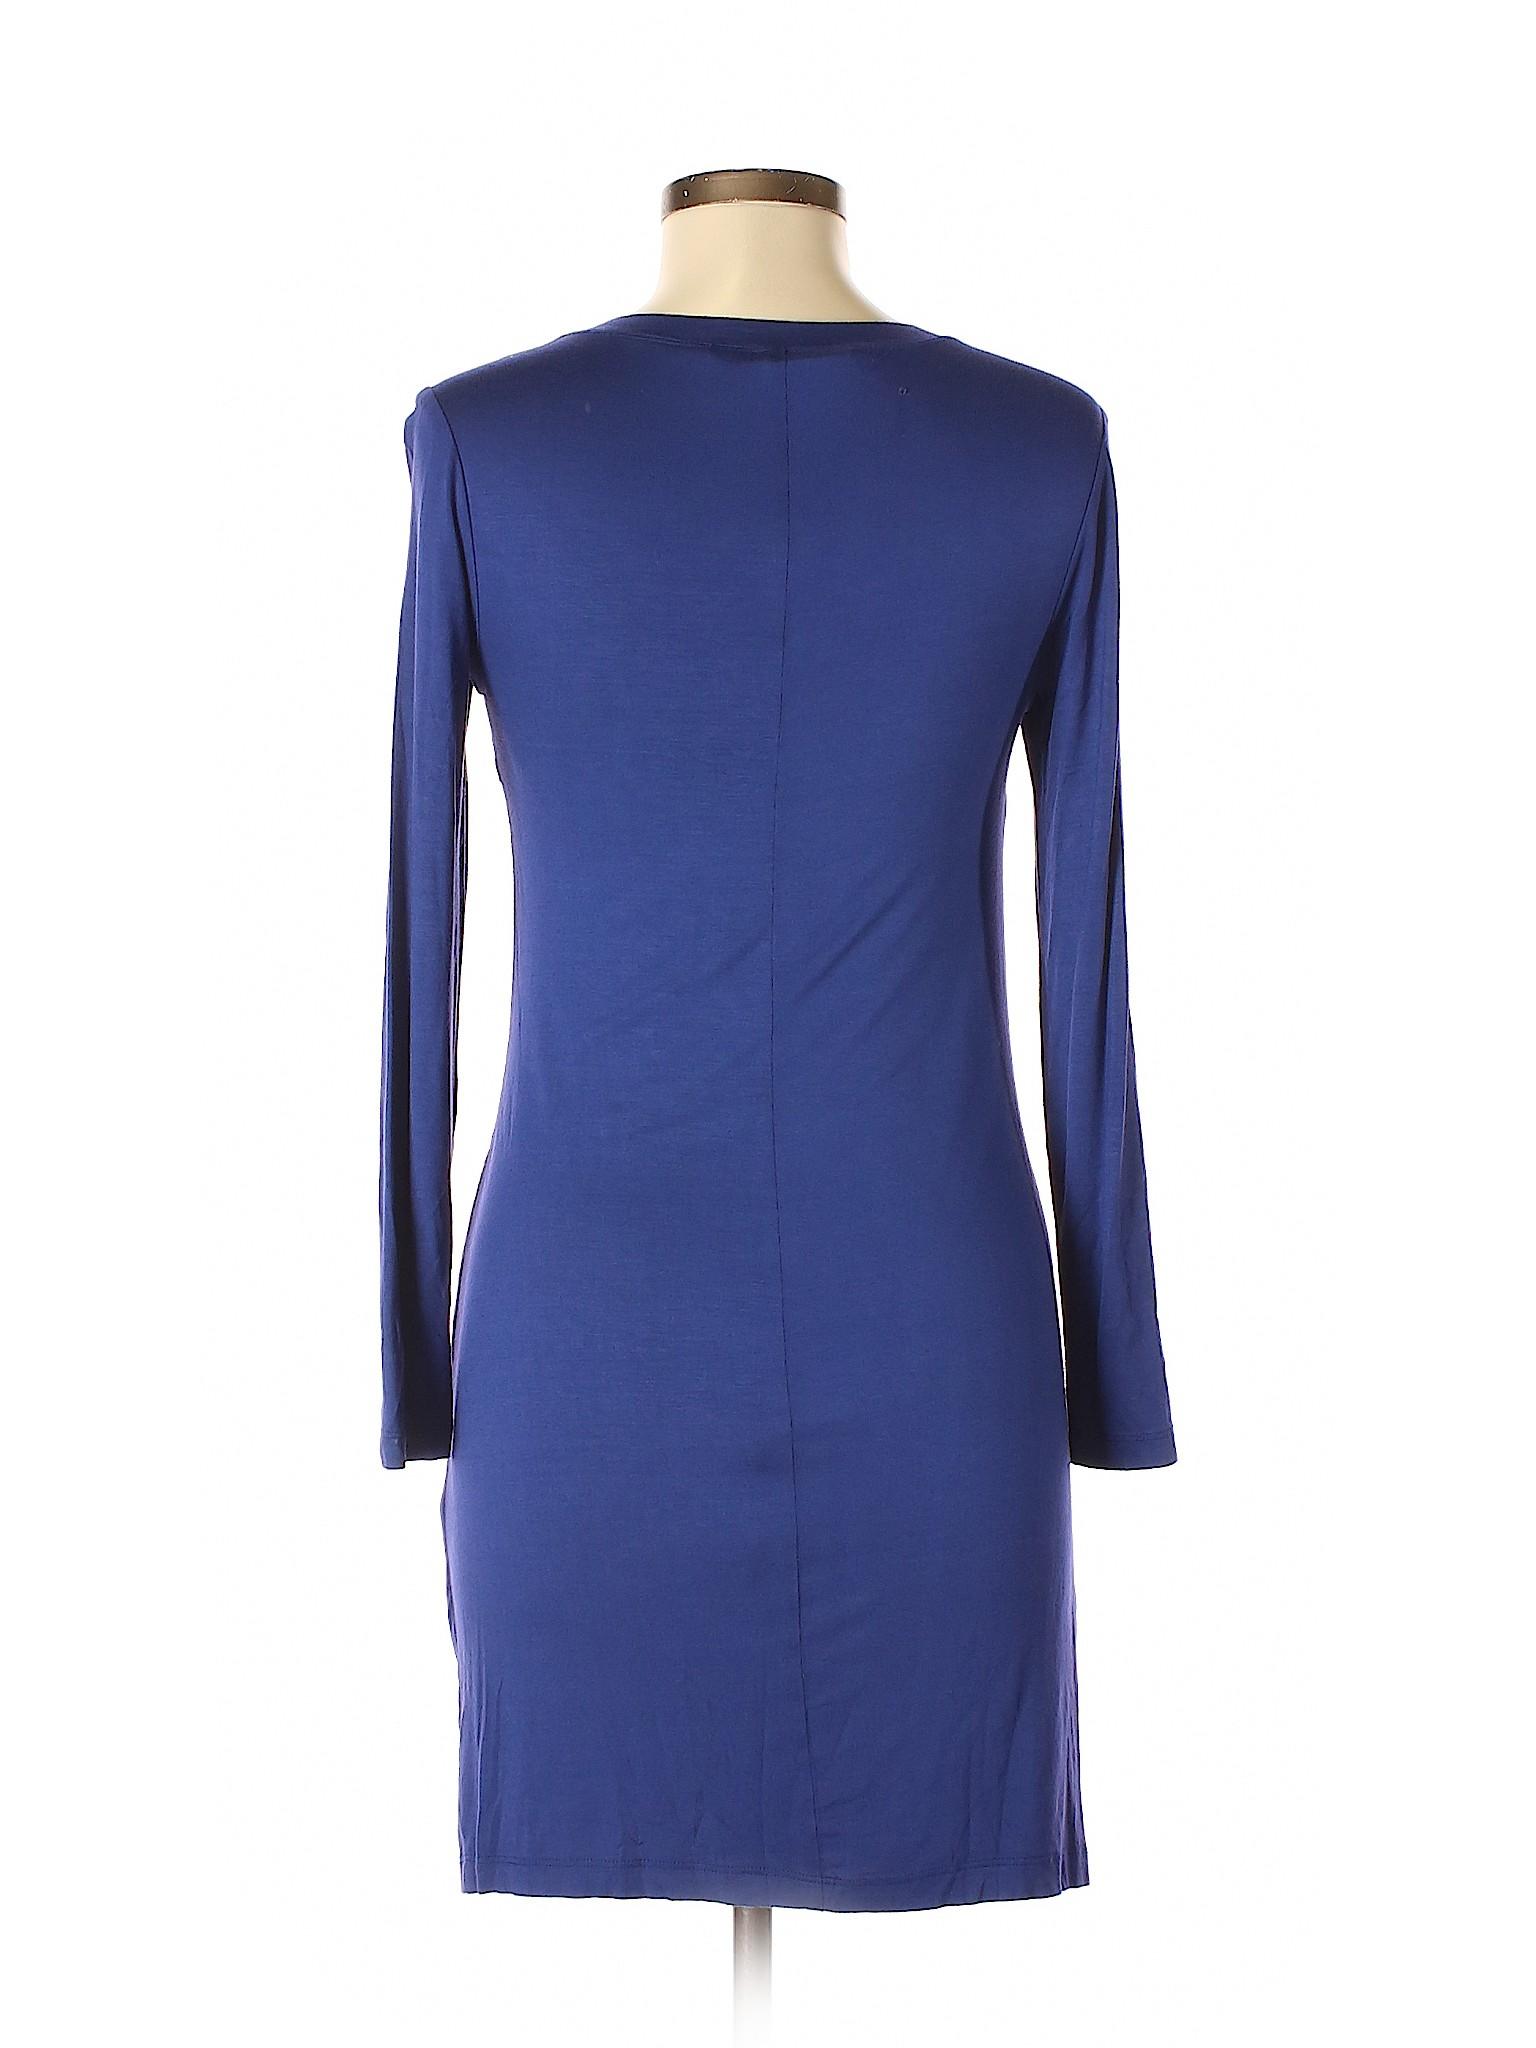 Dress Trina Casual Trina Selling Turk Casual Dress Trina Turk Selling Selling wZZPqOvE